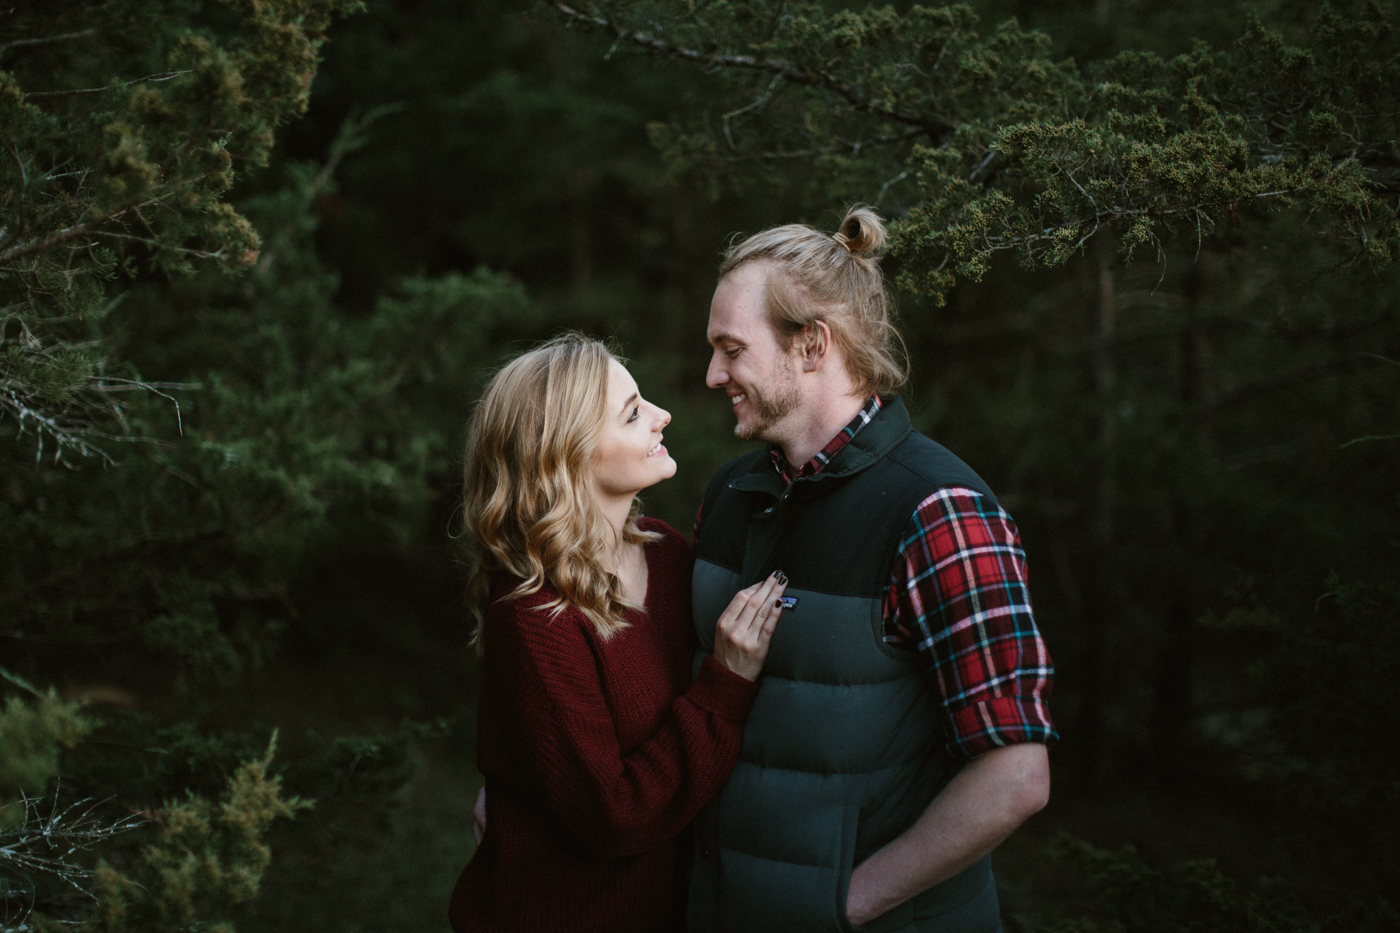 Sioux_Falls_Des_Moines_Engagement_Wedding_Photographer_43.jpg